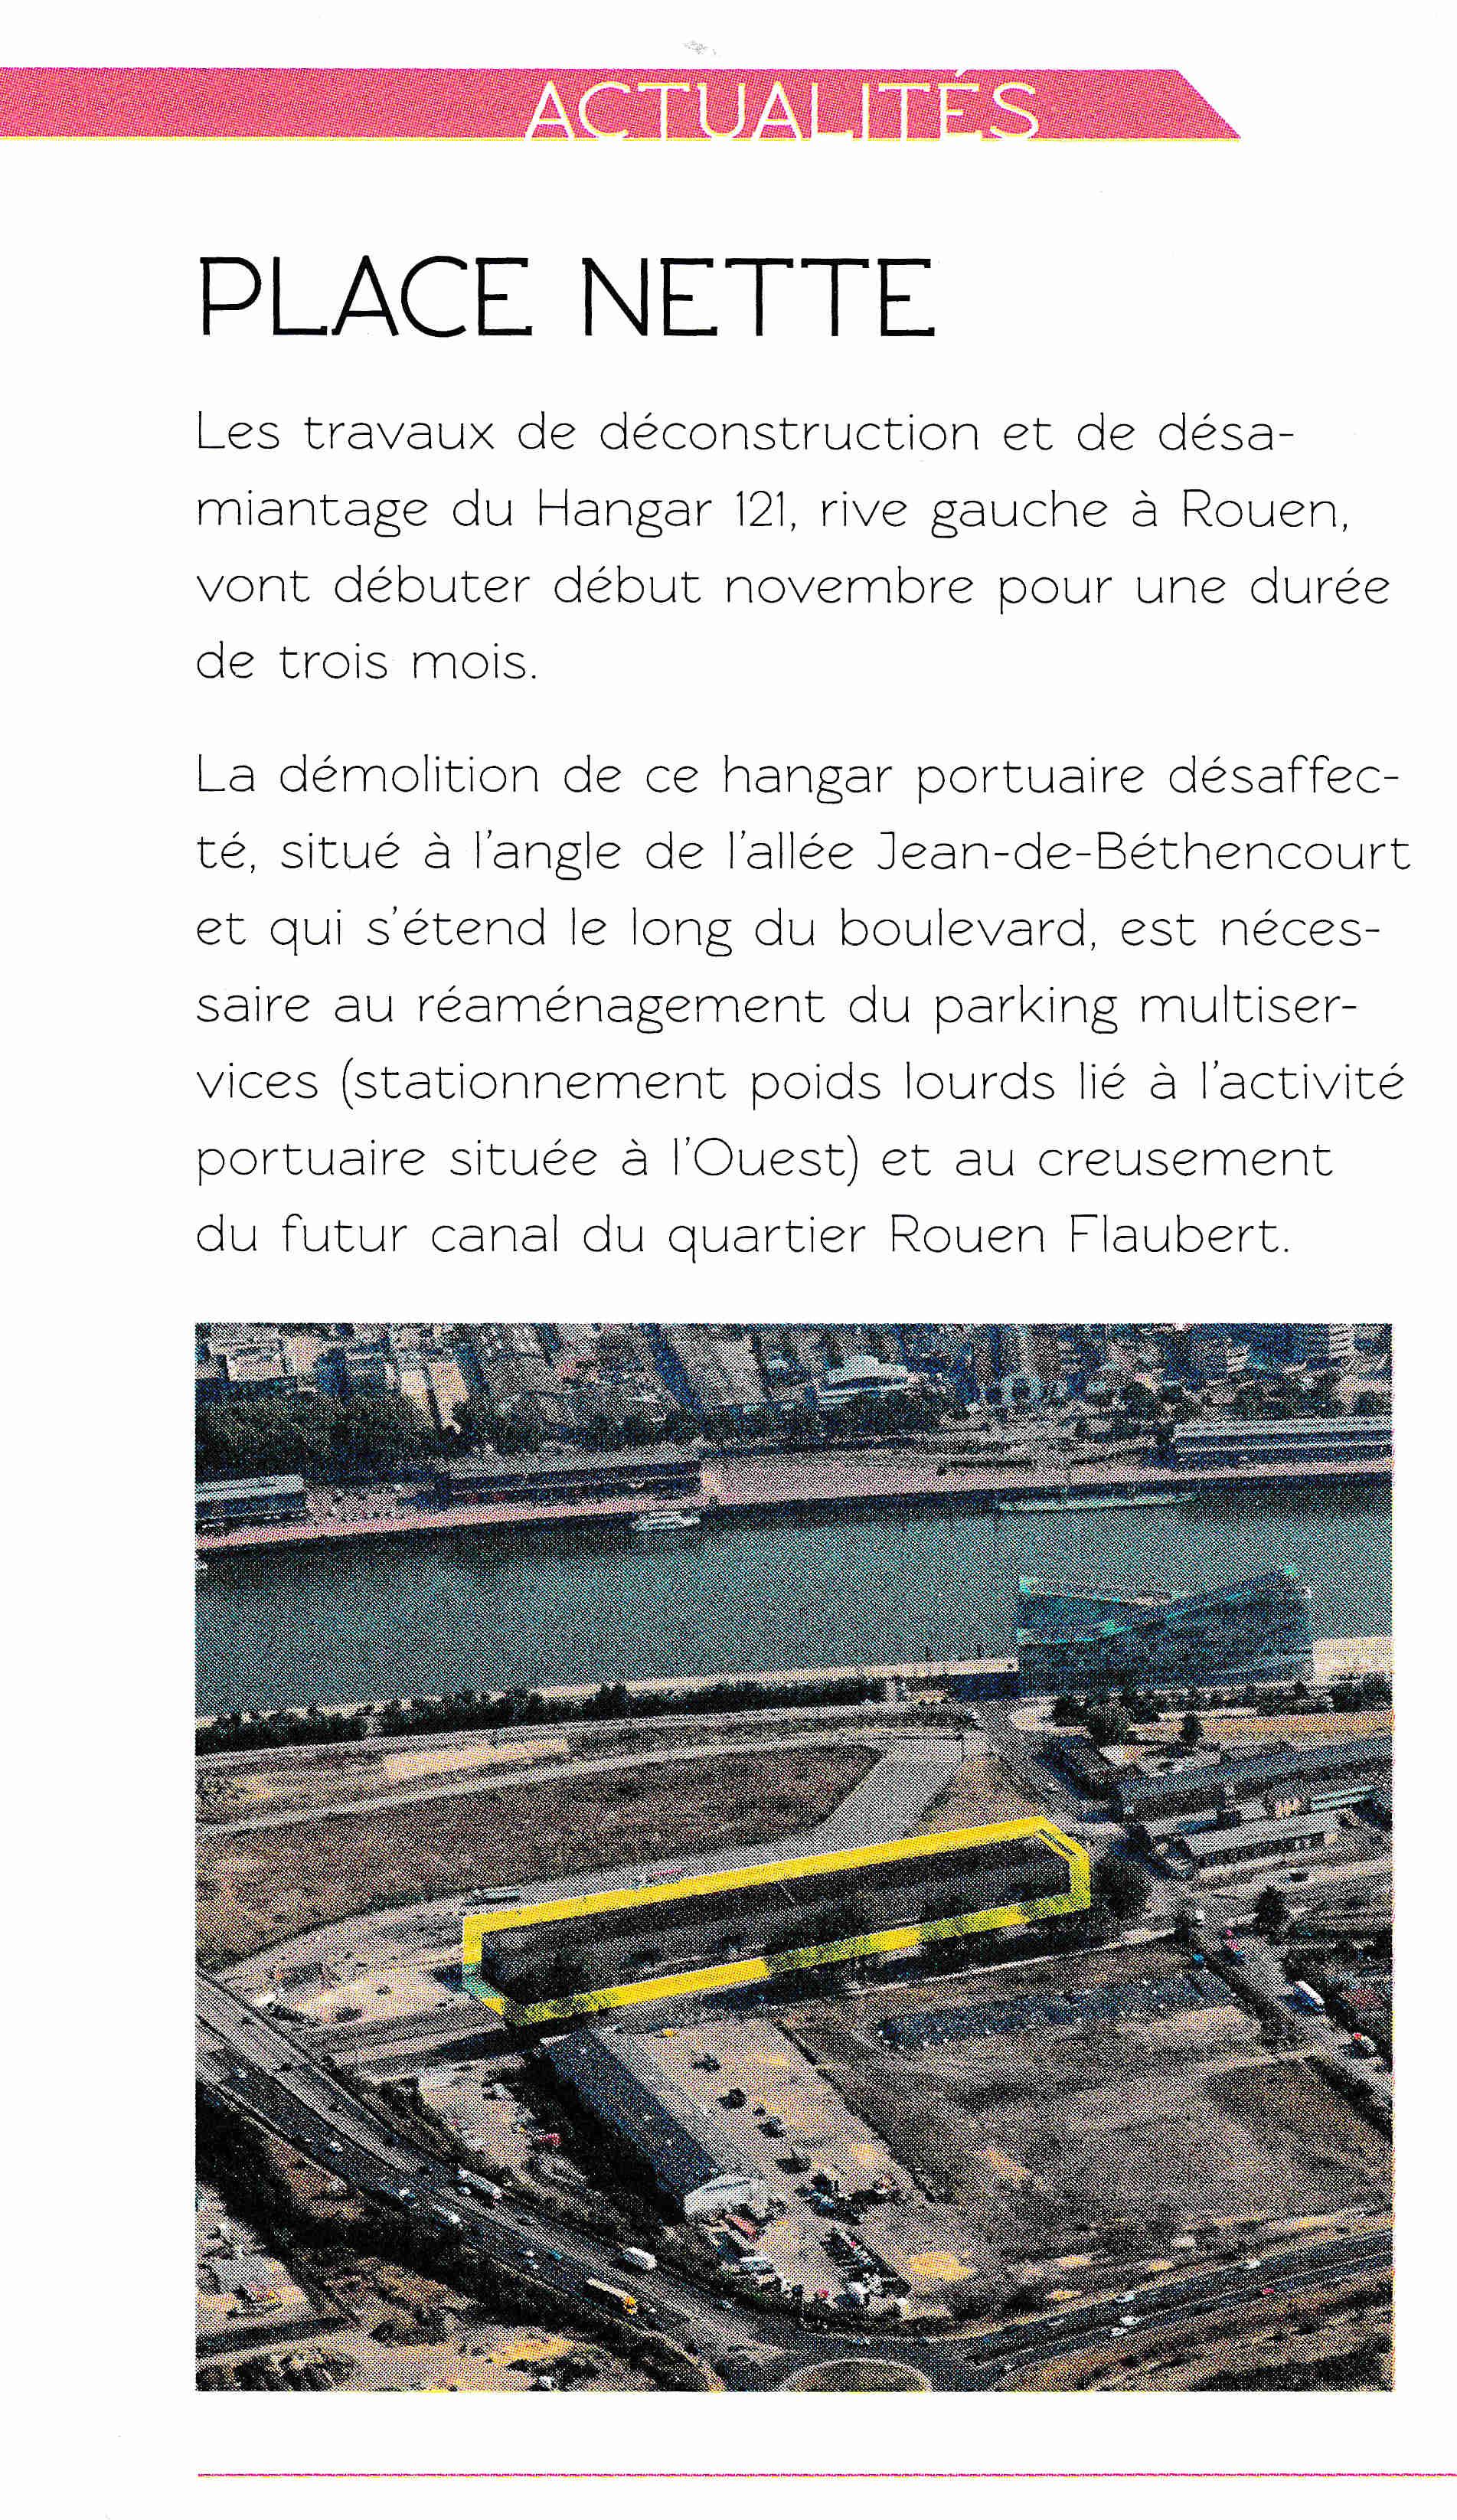 [Bientôt visible sur Google Earth] - Rouen - Ecoquartier Flaubert Metrom10